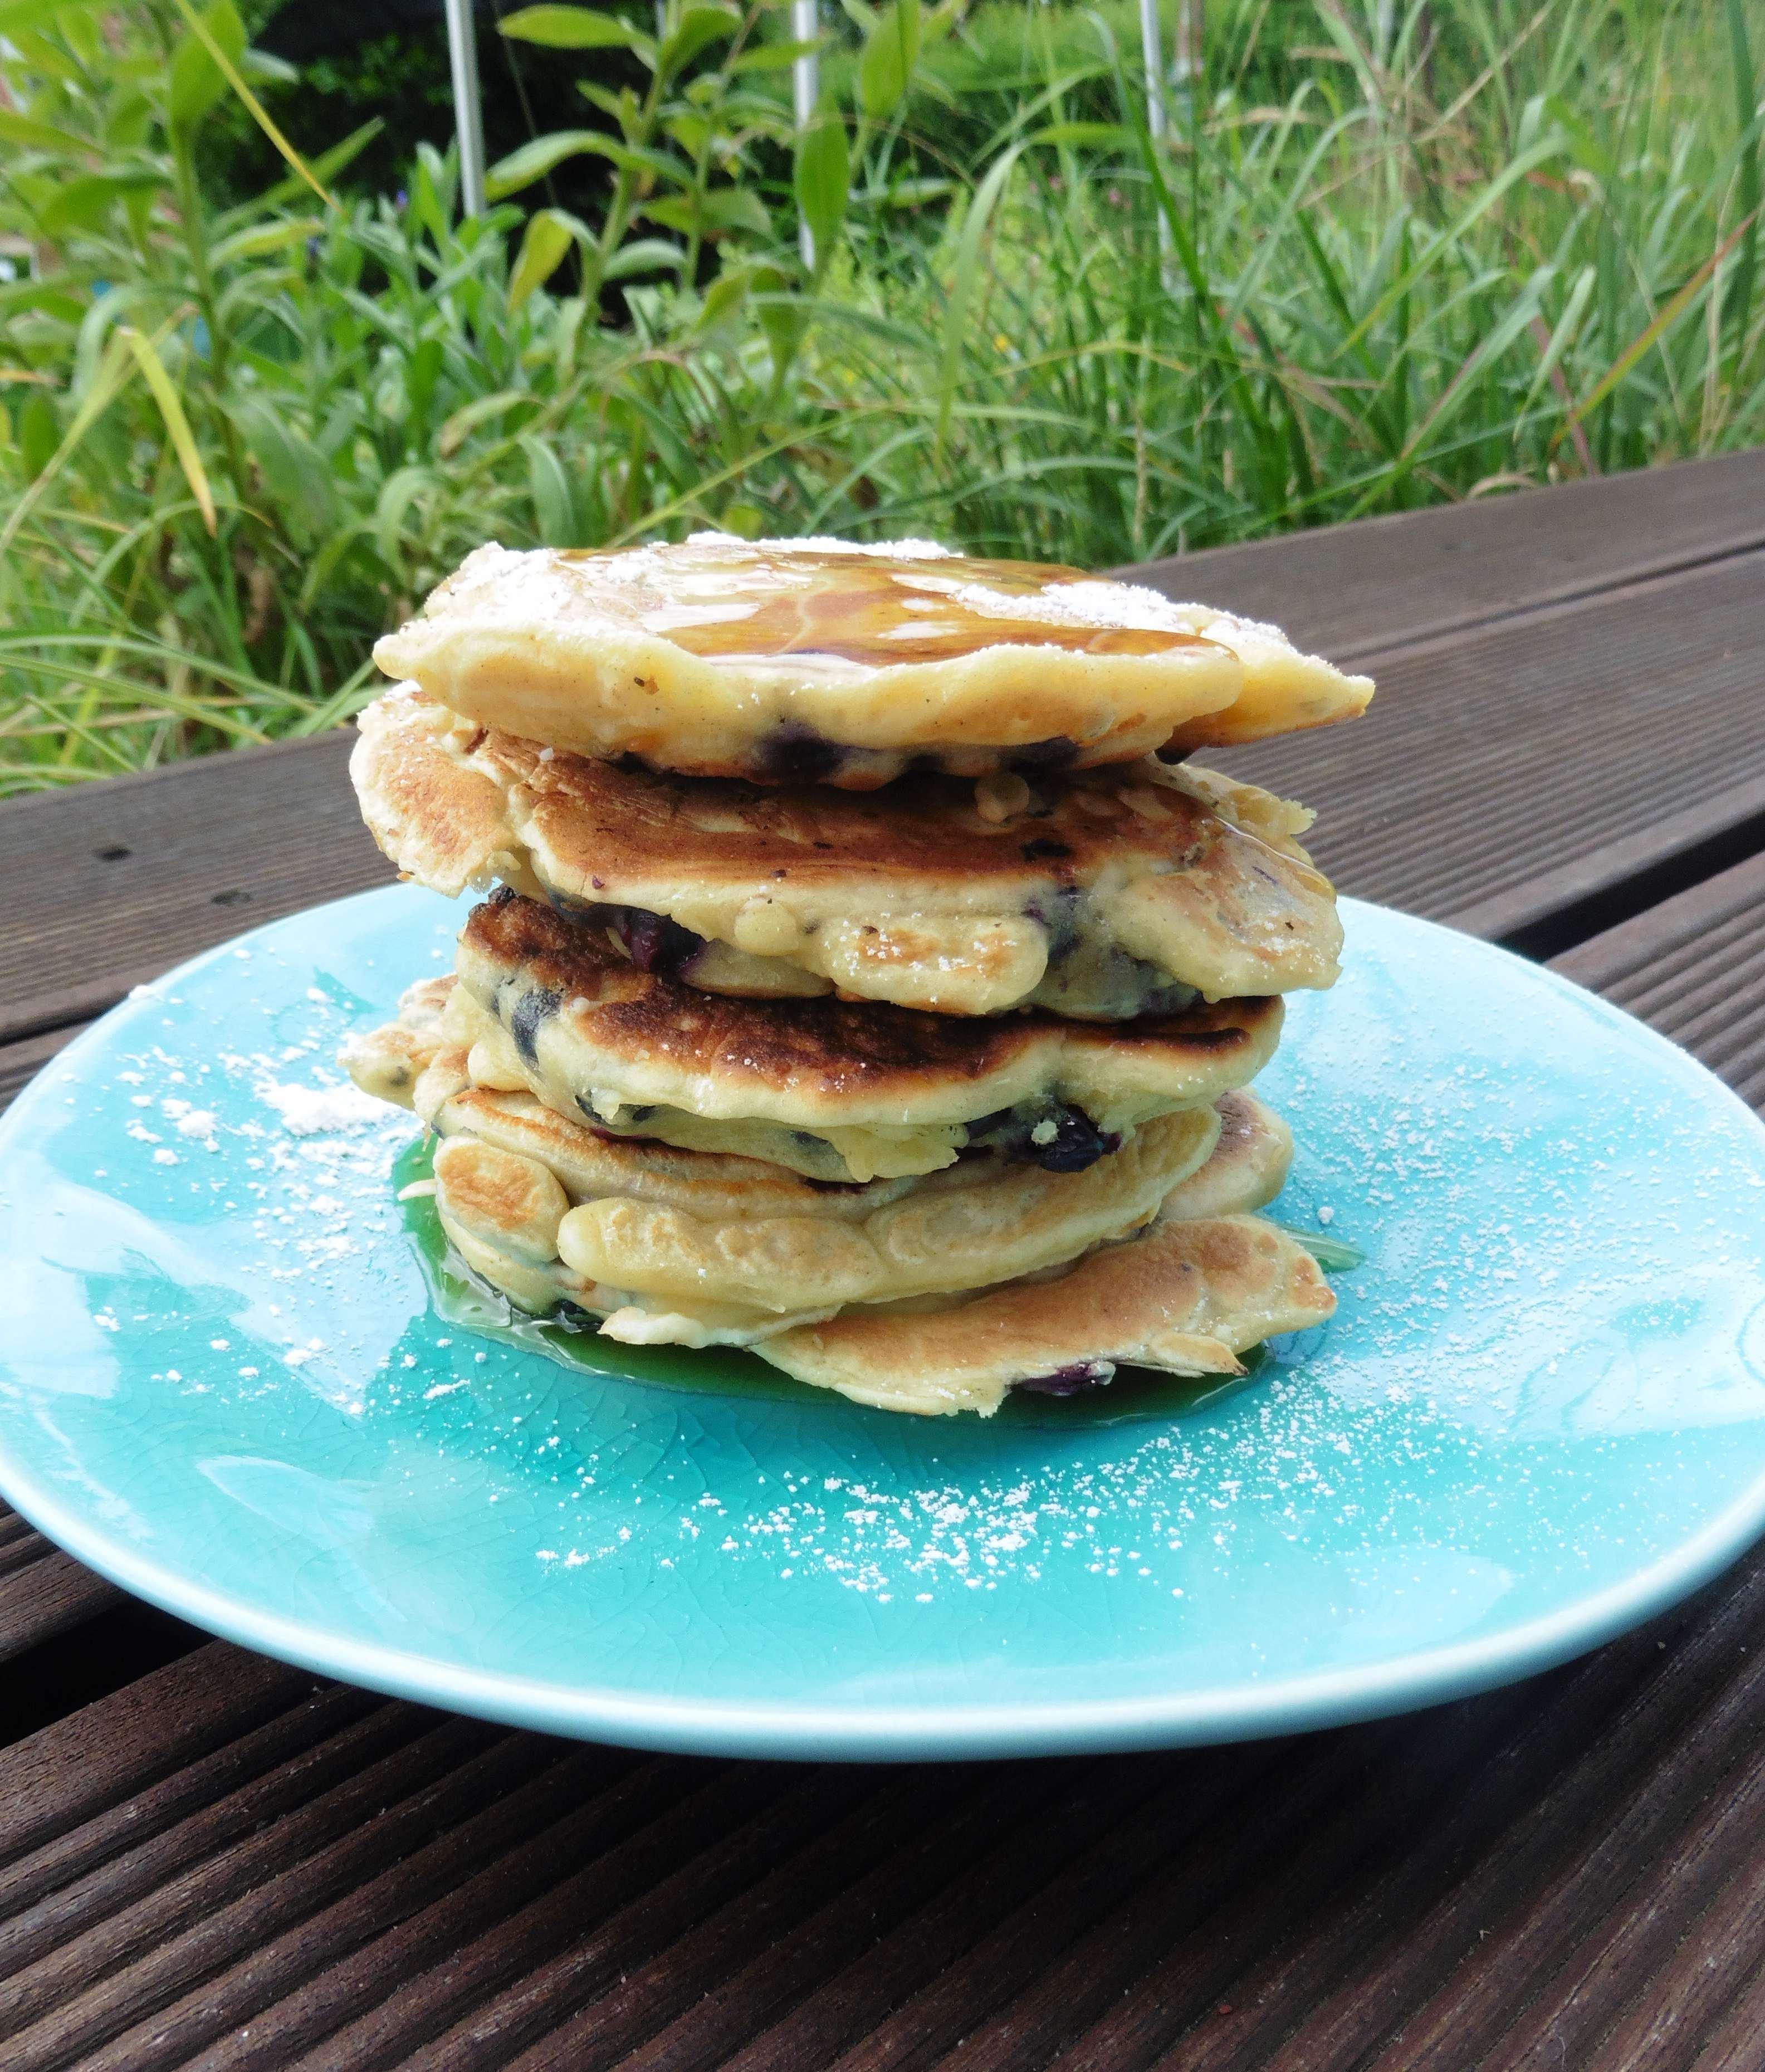 Blaubeer-Frischkäse-Pancakes